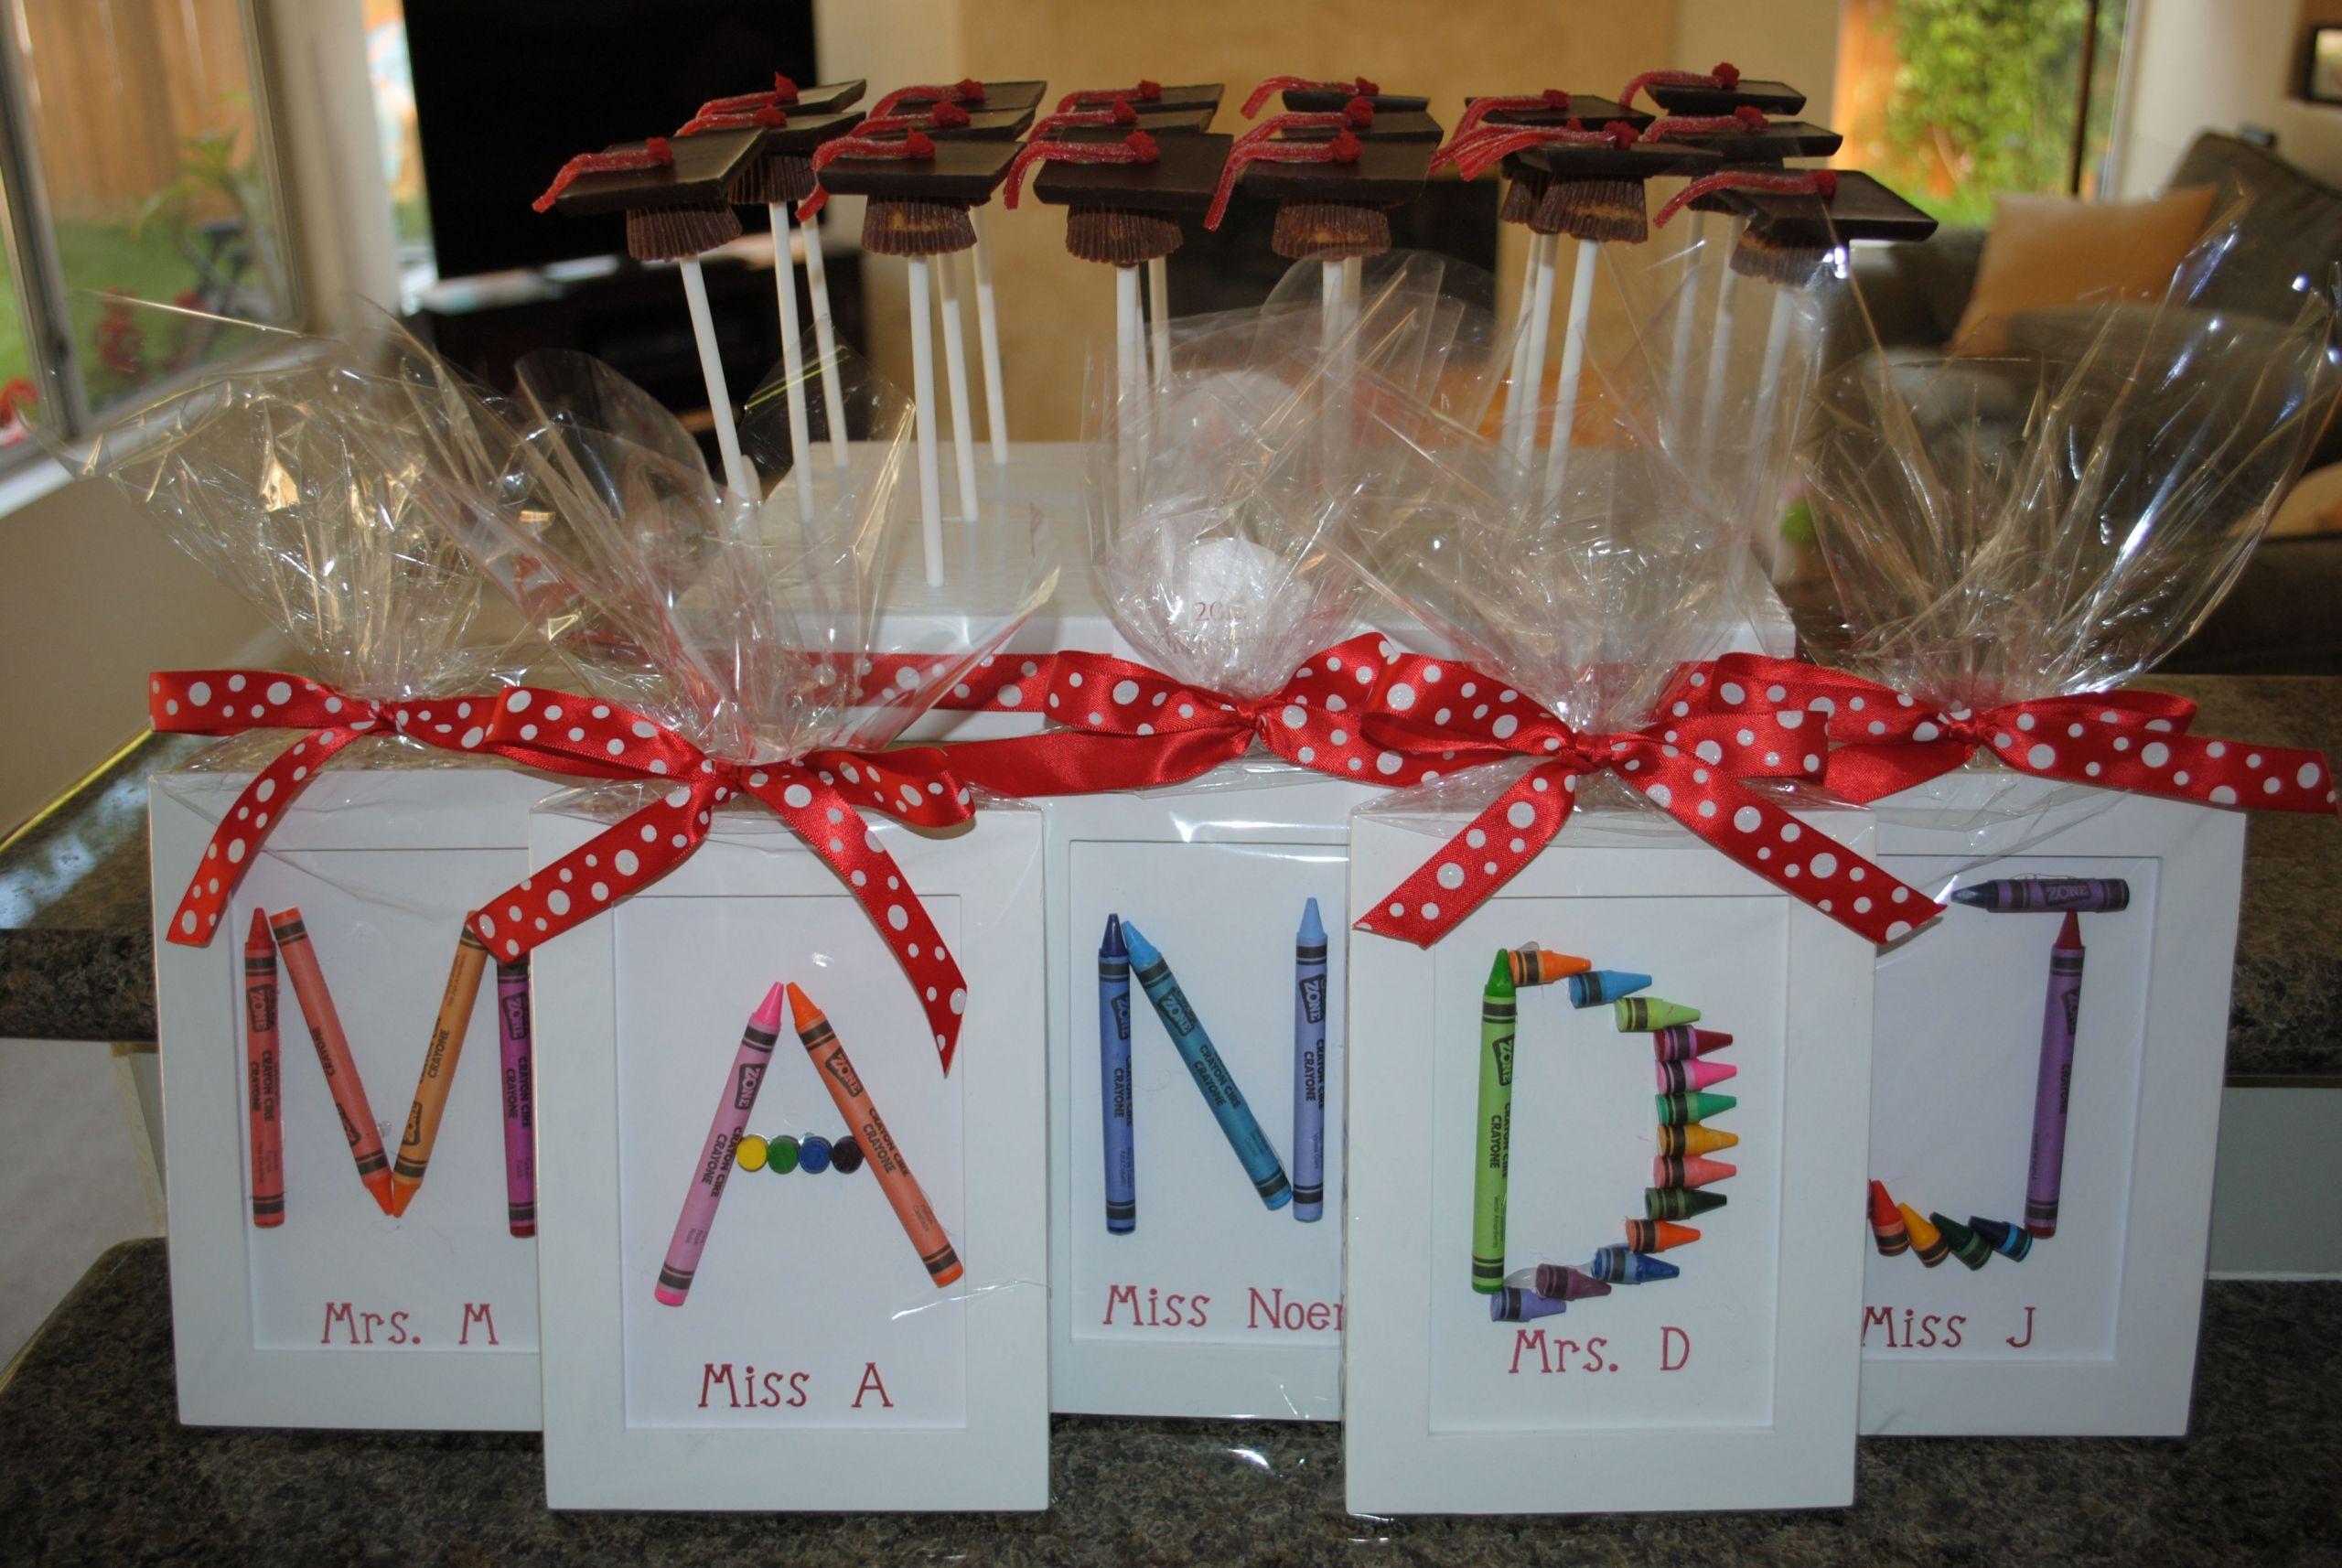 Preschool Graduation Gift Ideas From Teacher  Make for students instead of teachers Very cute